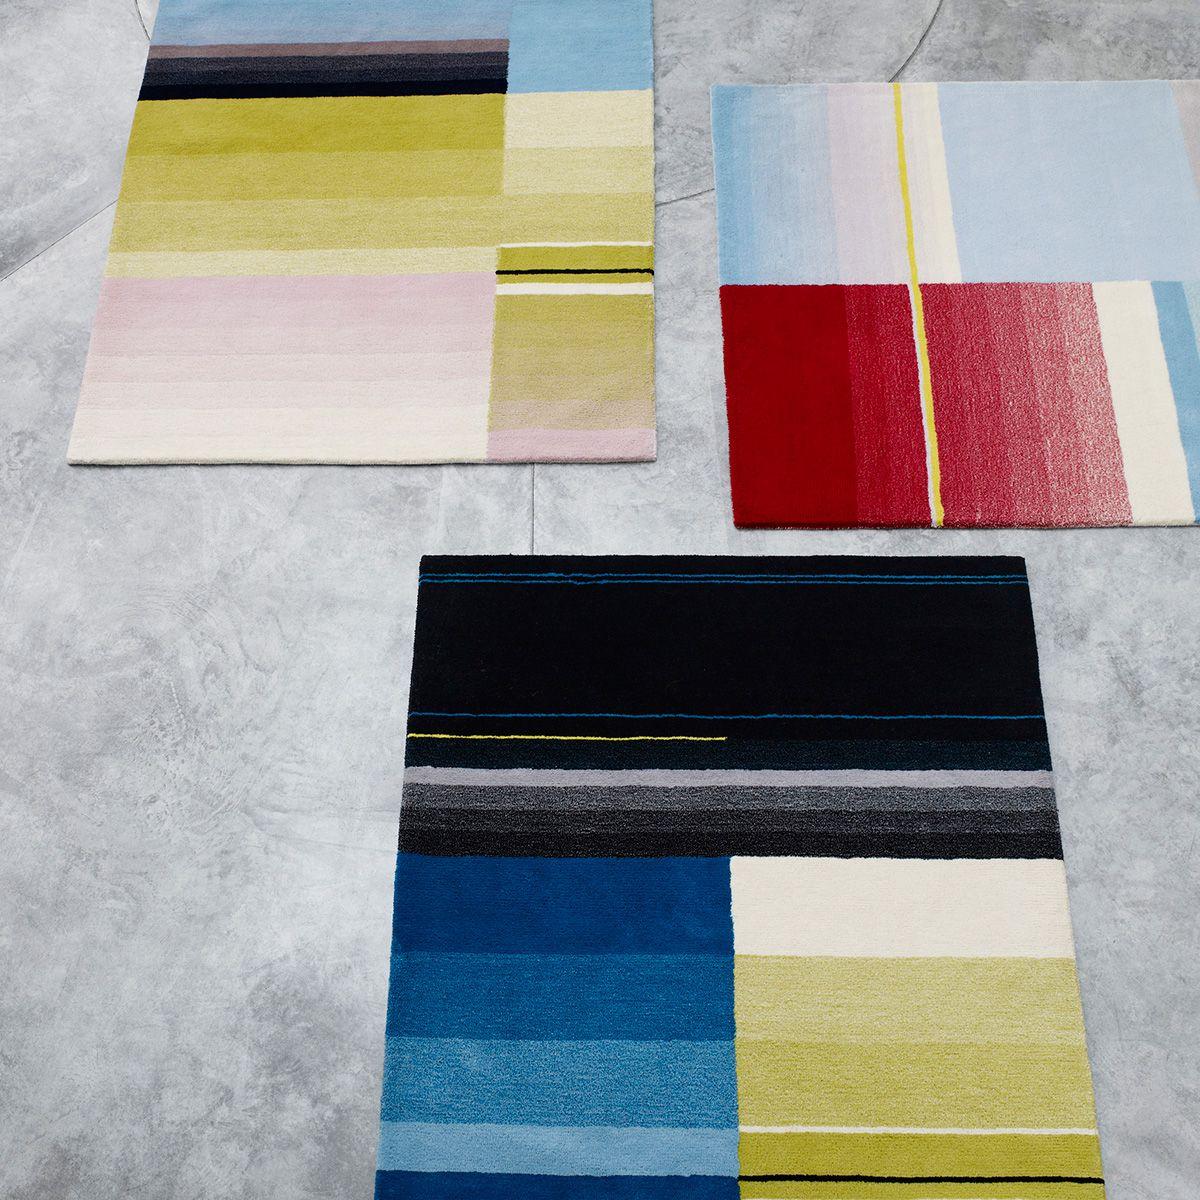 Hay Teppich hay teppich colour carpet hay artvoll topmarke artvoll de